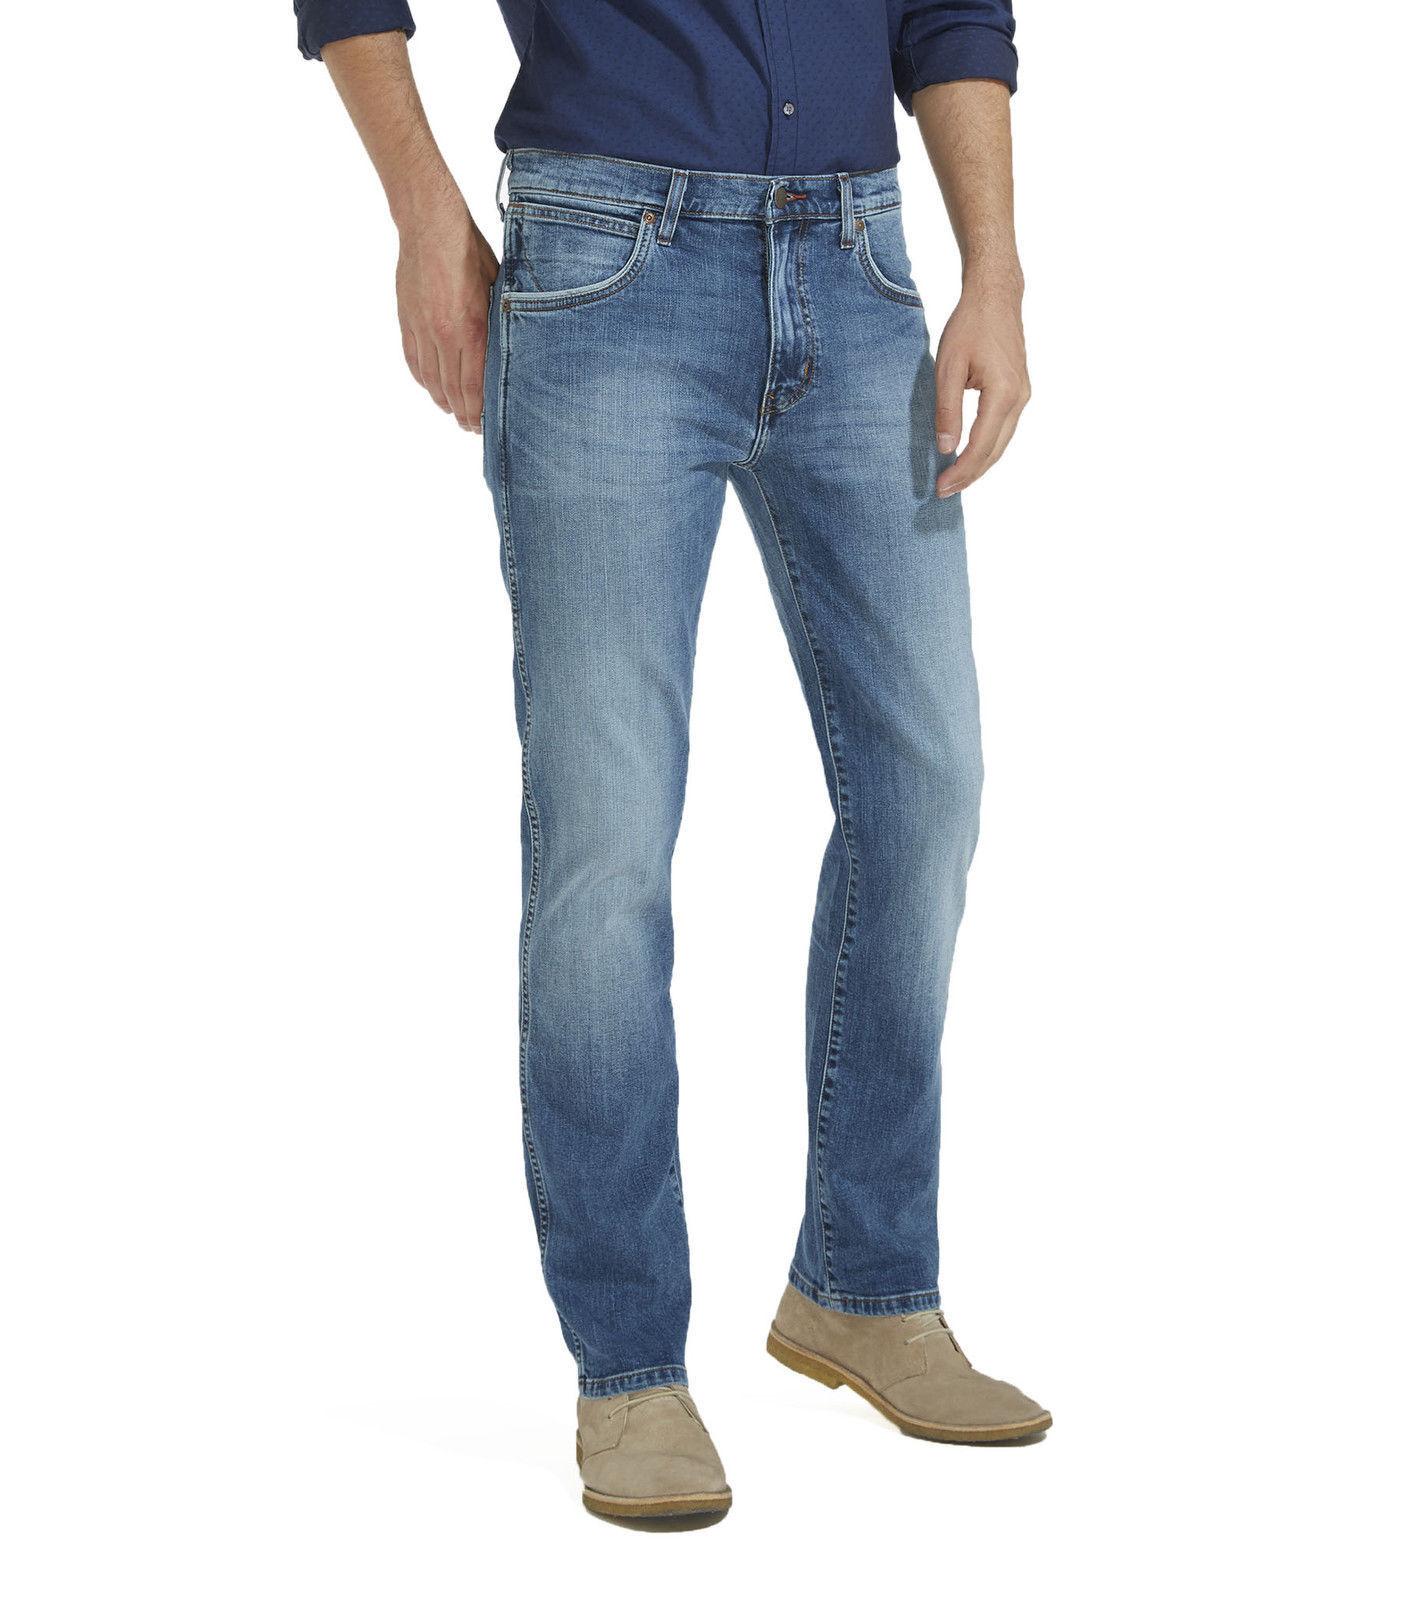 c313e69dc350 WRANGLER jeans originale Uomo Jeans Pantaloni Arizona Merce Nuova Blu  w120xg62u noslzt5259-Jeans